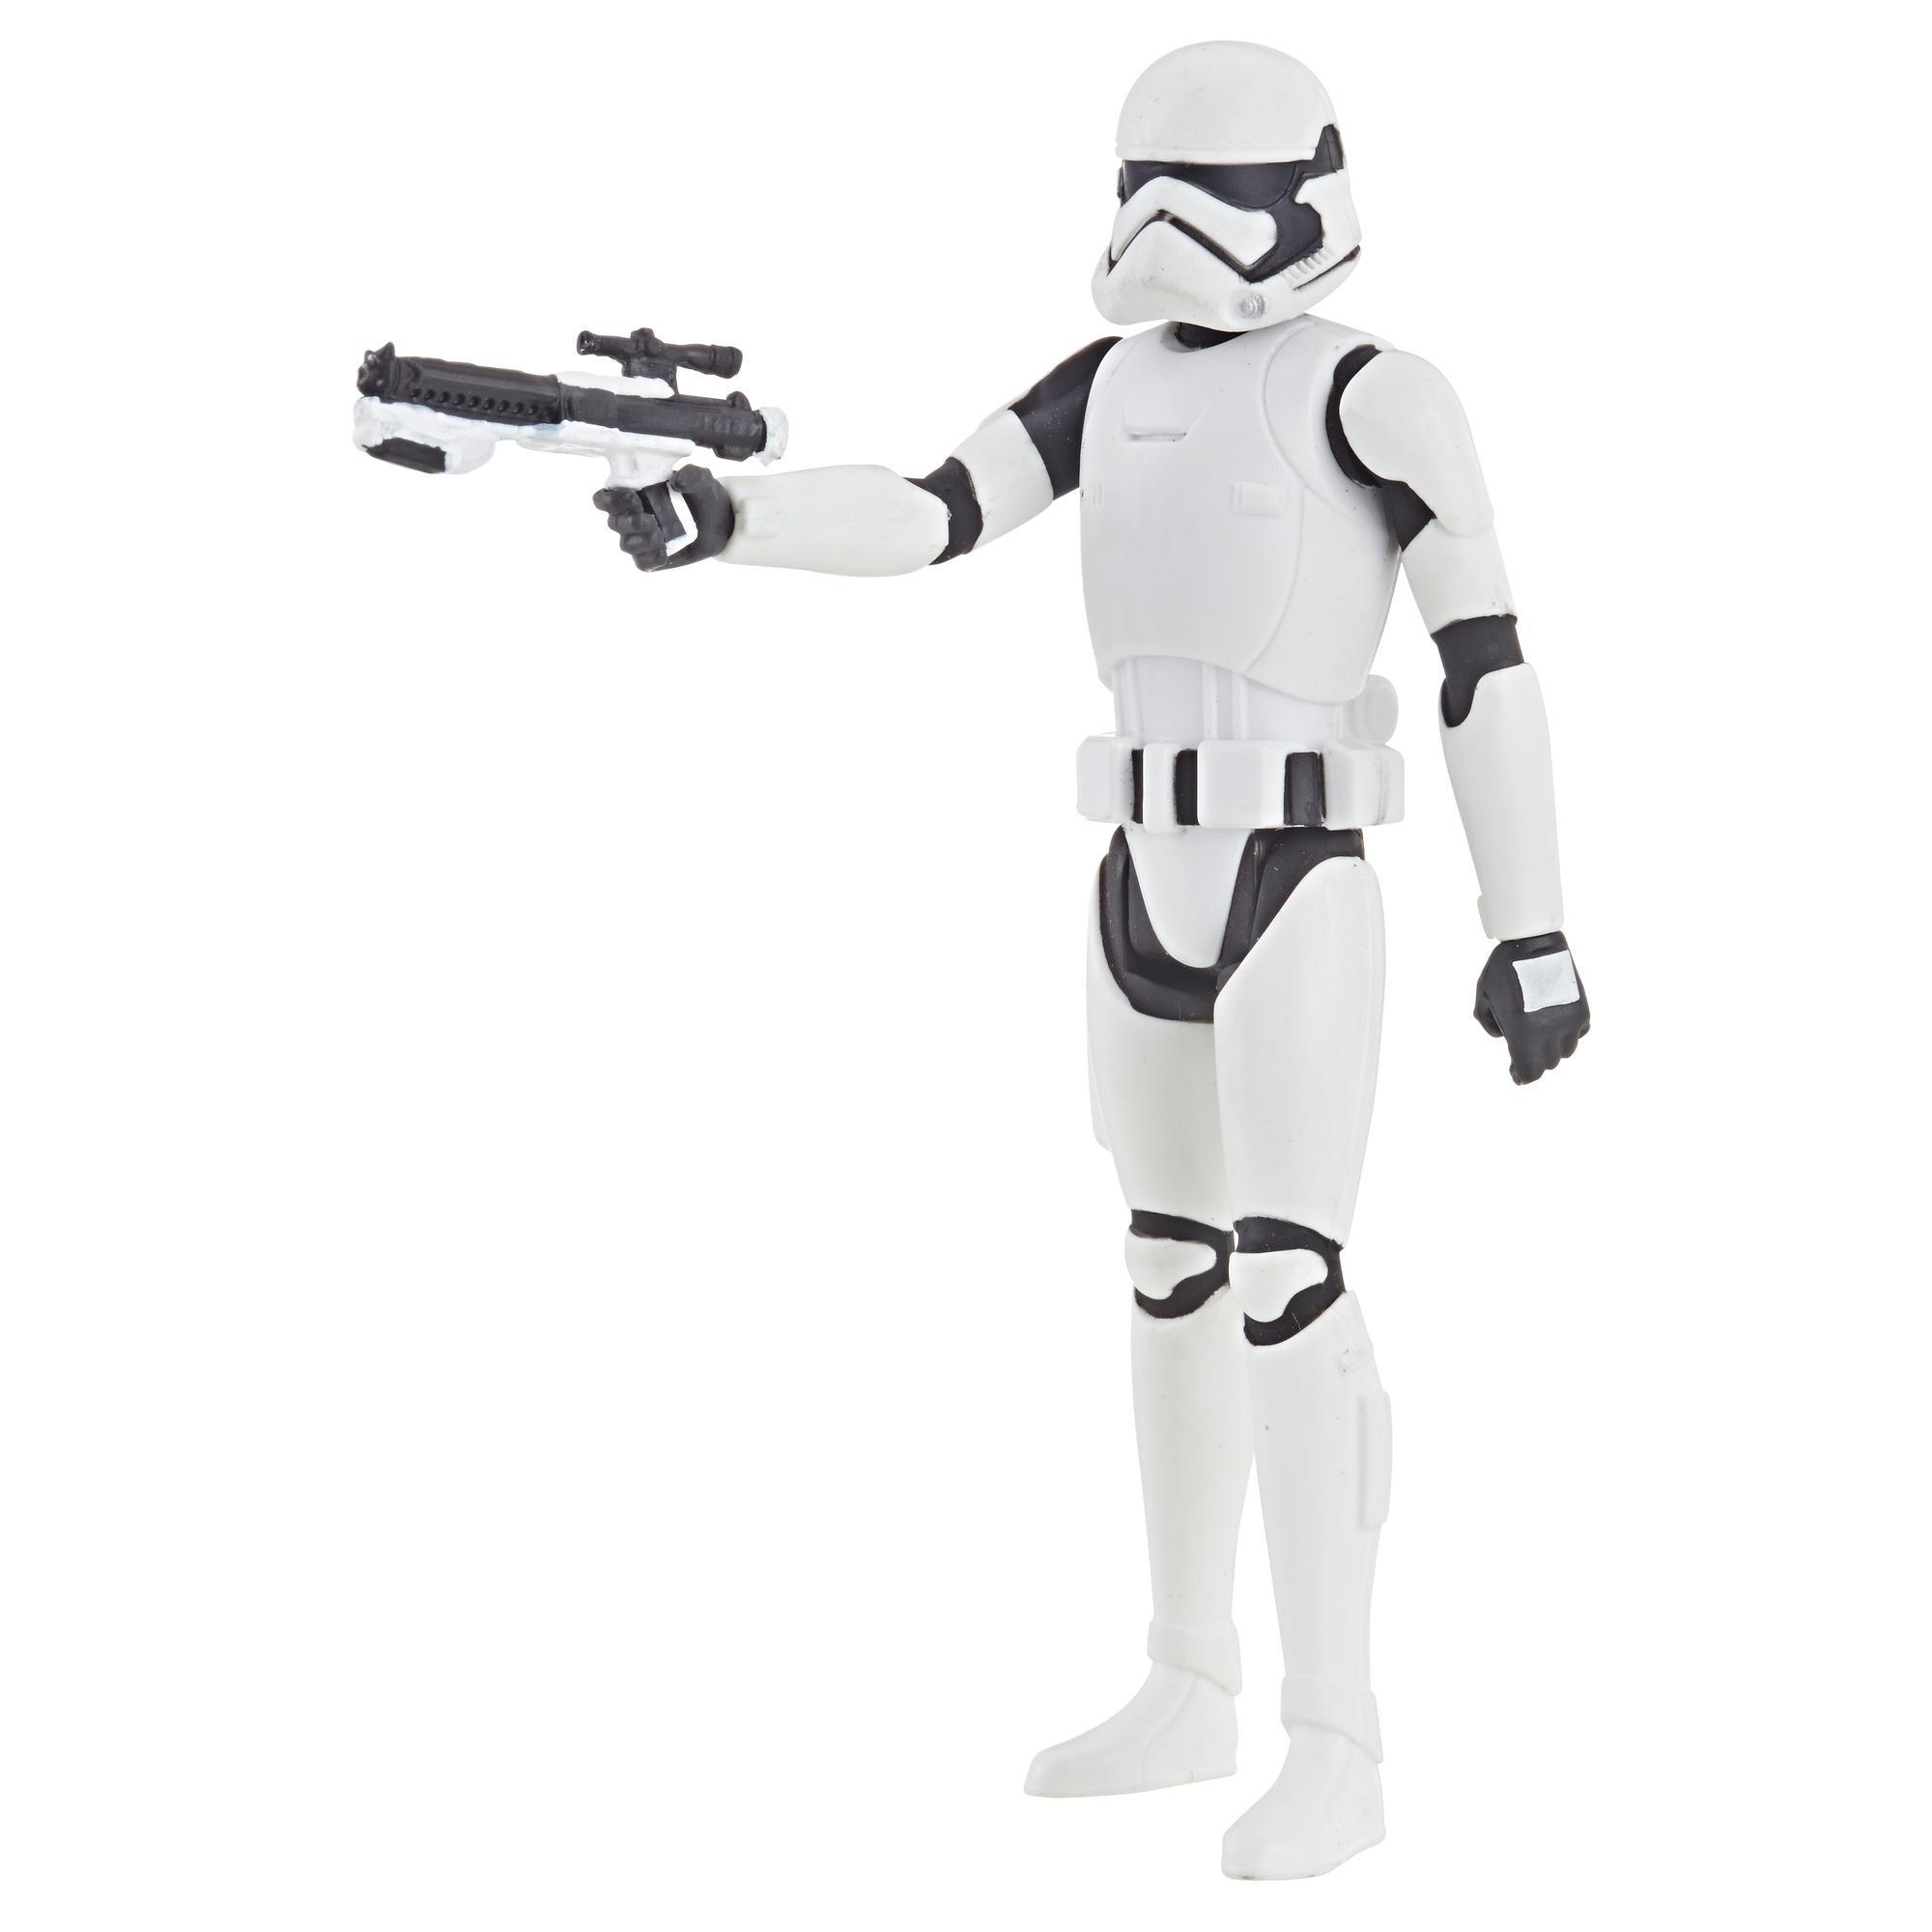 Star Wars Série animée Star Wars: Resistance - Figurine Stormtrooper du Premier Ordre de 9,5 cm